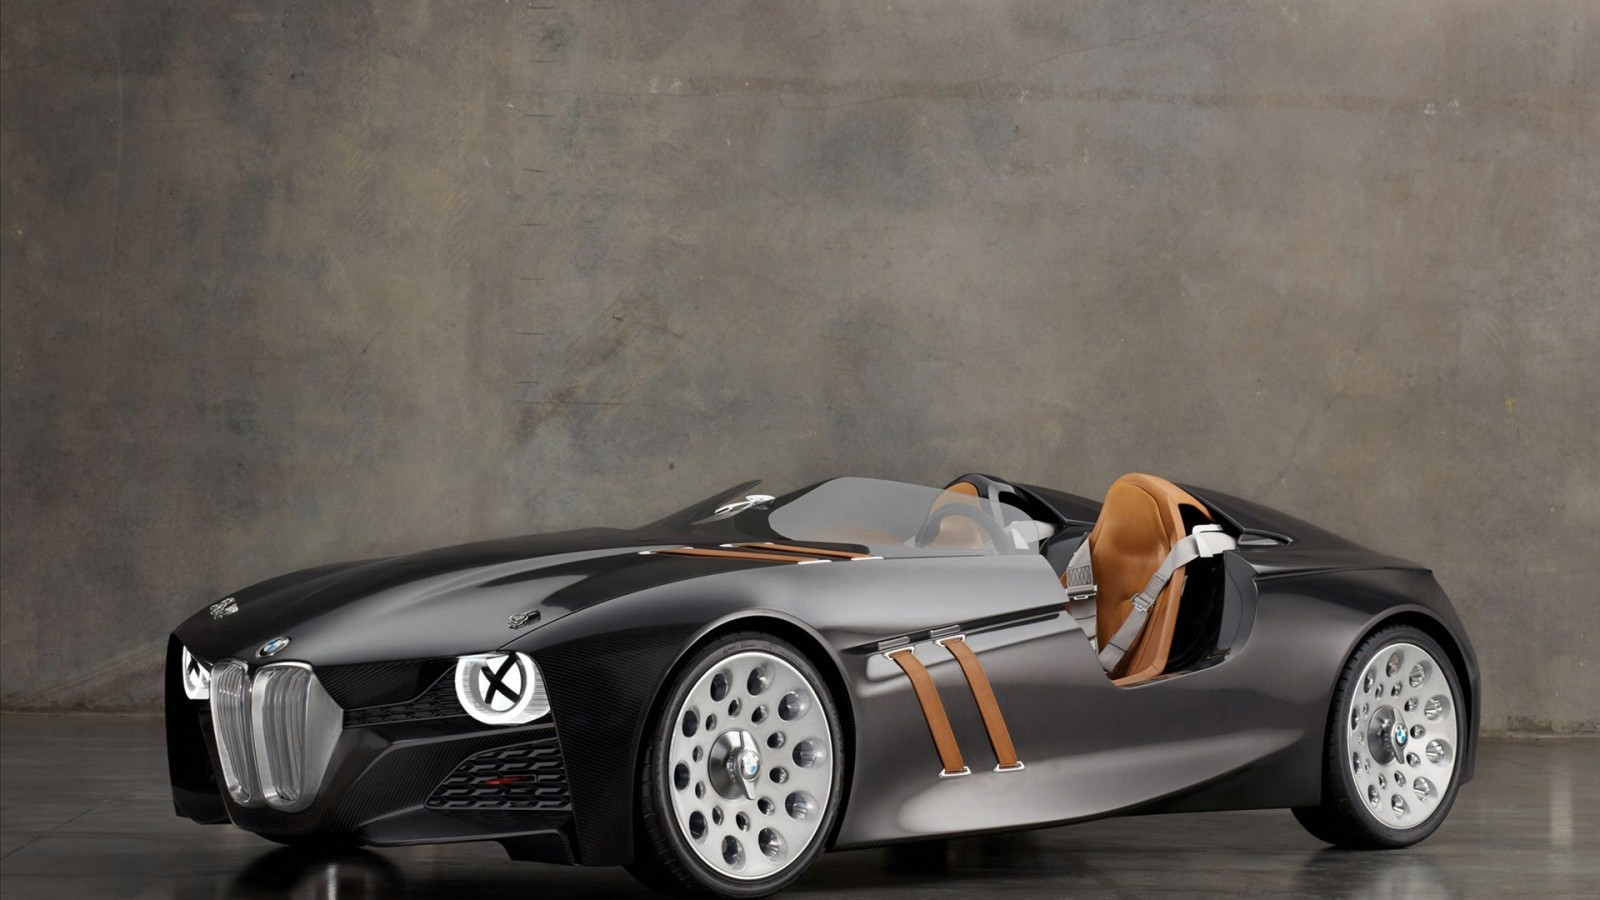 BMW 1600 CABRIOLET black